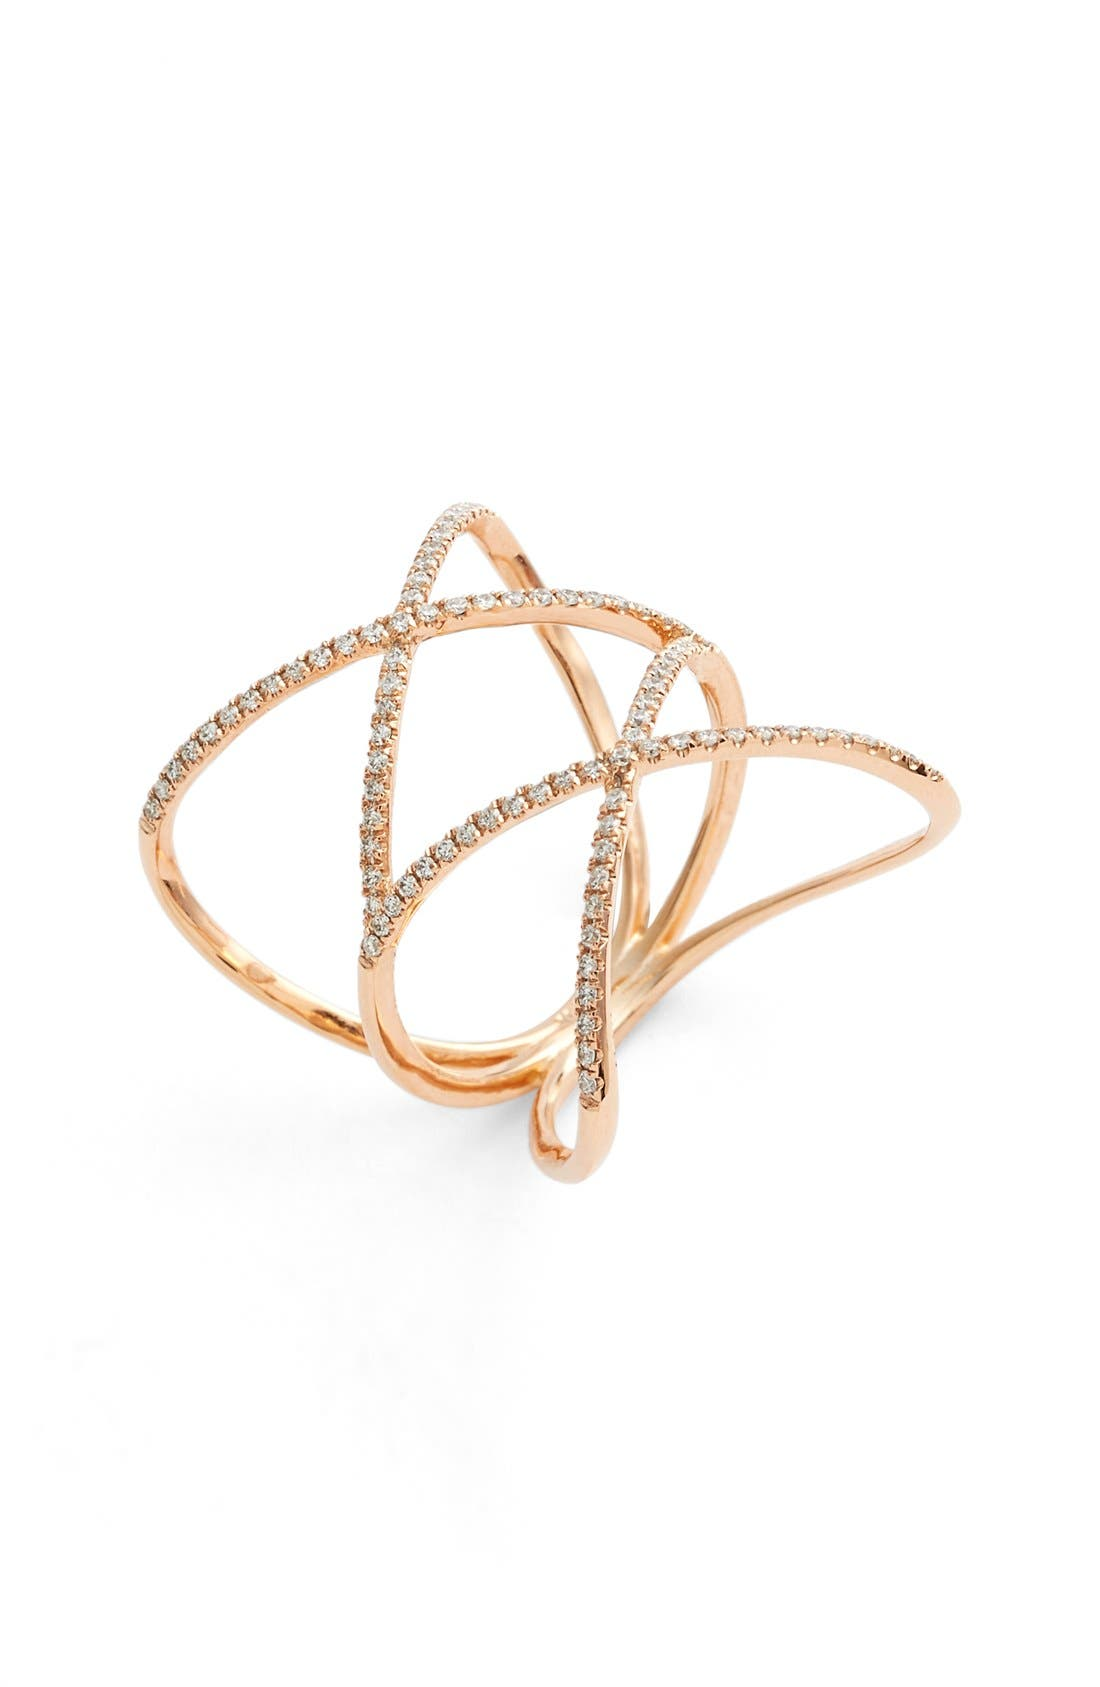 BONY LEVY Diamond Double Crisscross Ring